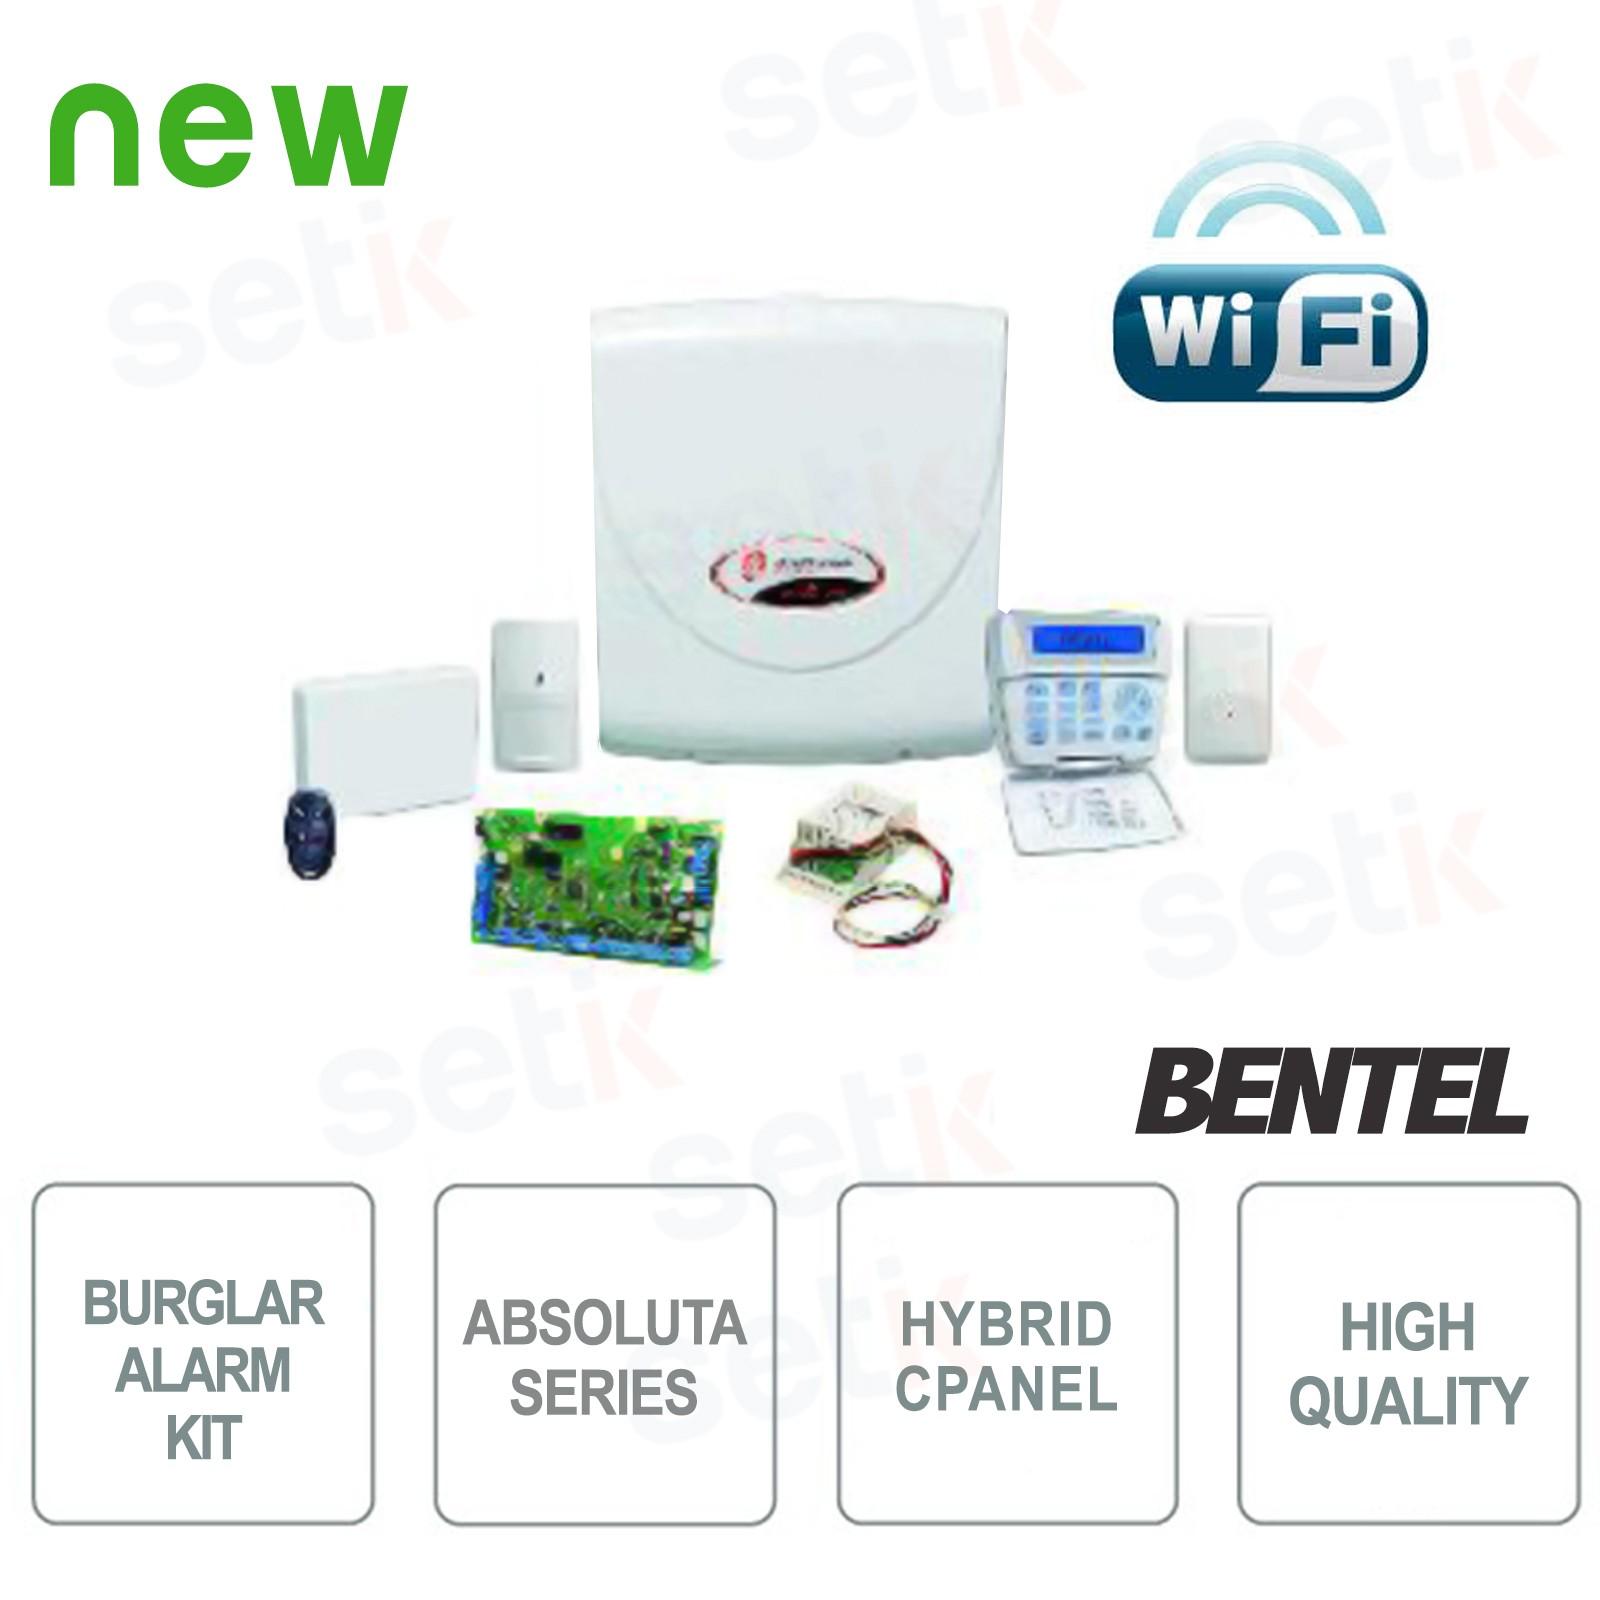 Abs 14kitsw kit antifurto completo bentel security for Bentel security absoluta